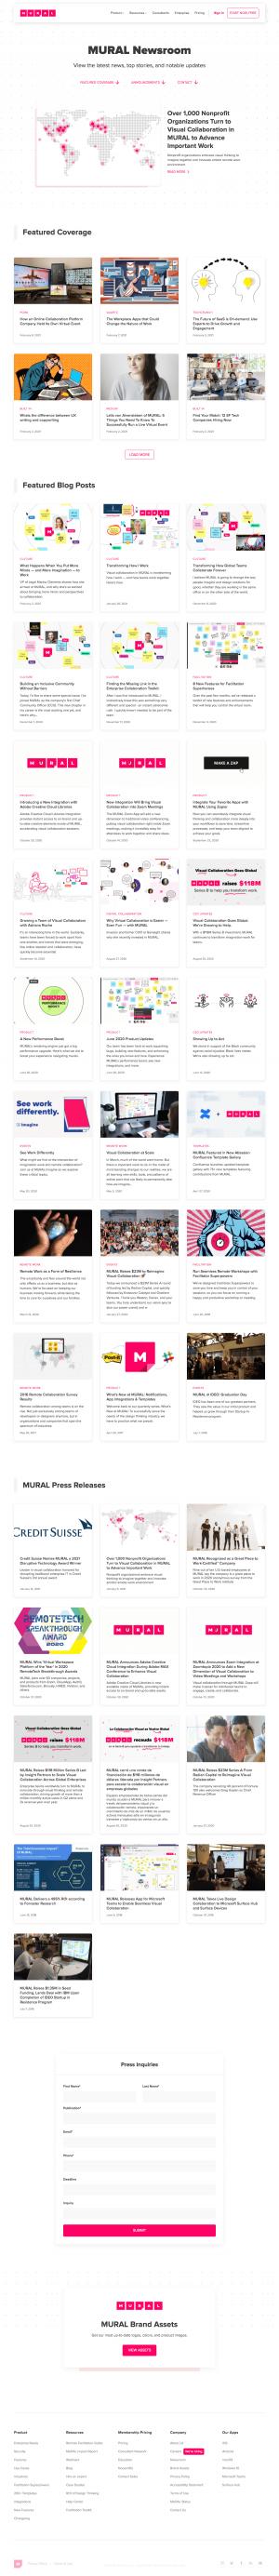 Mural – Newsroom